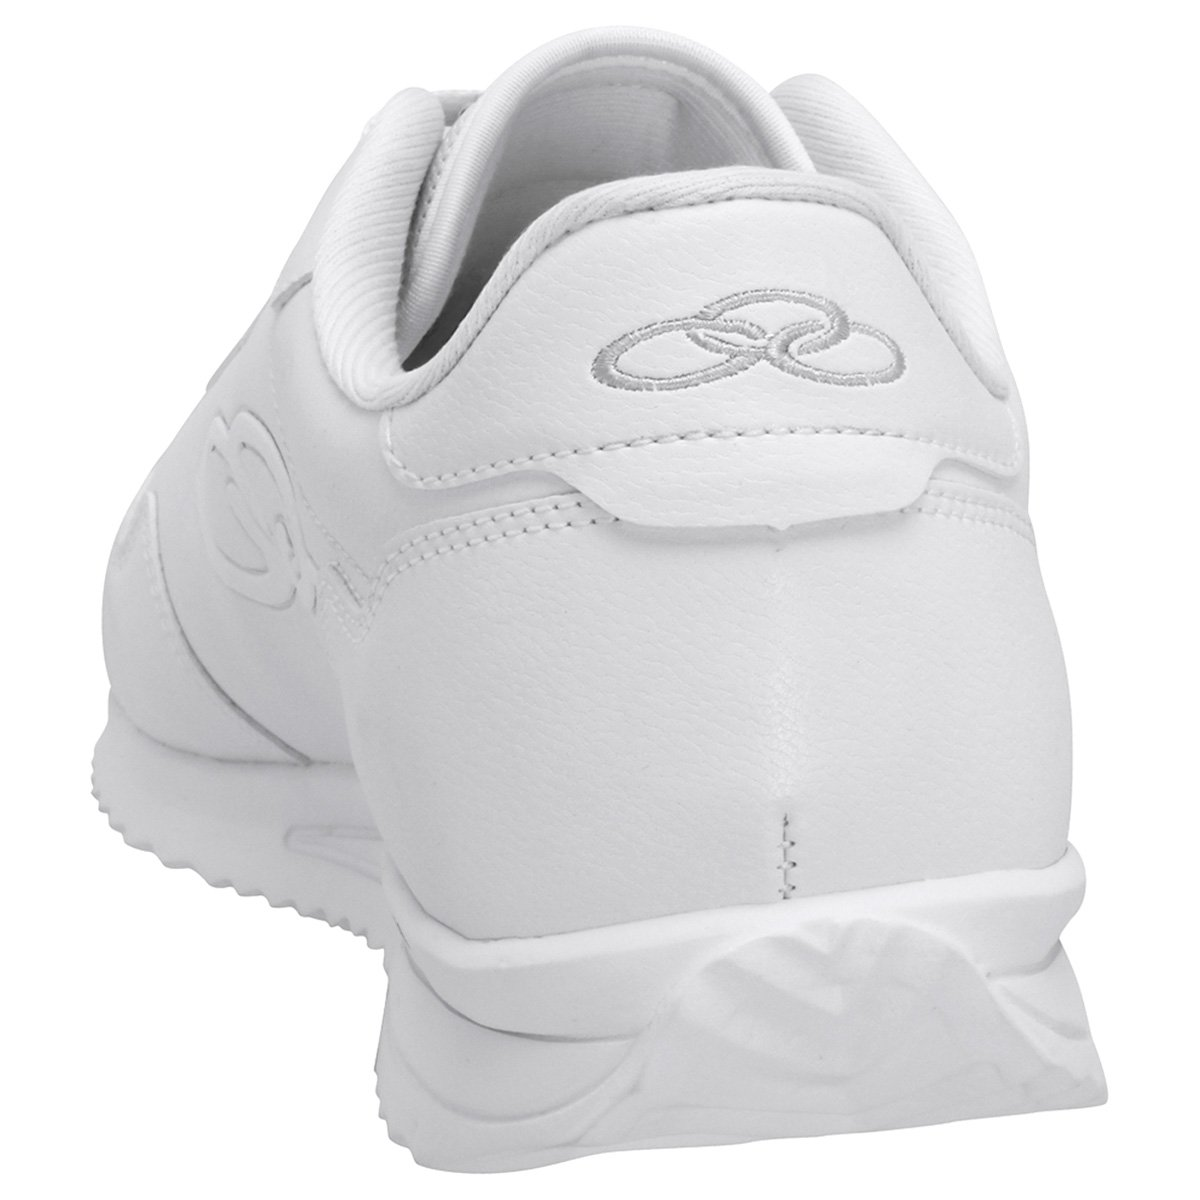 Tênis Olympikus Jogging 200 359 - Compre Agora  dd658b4661669